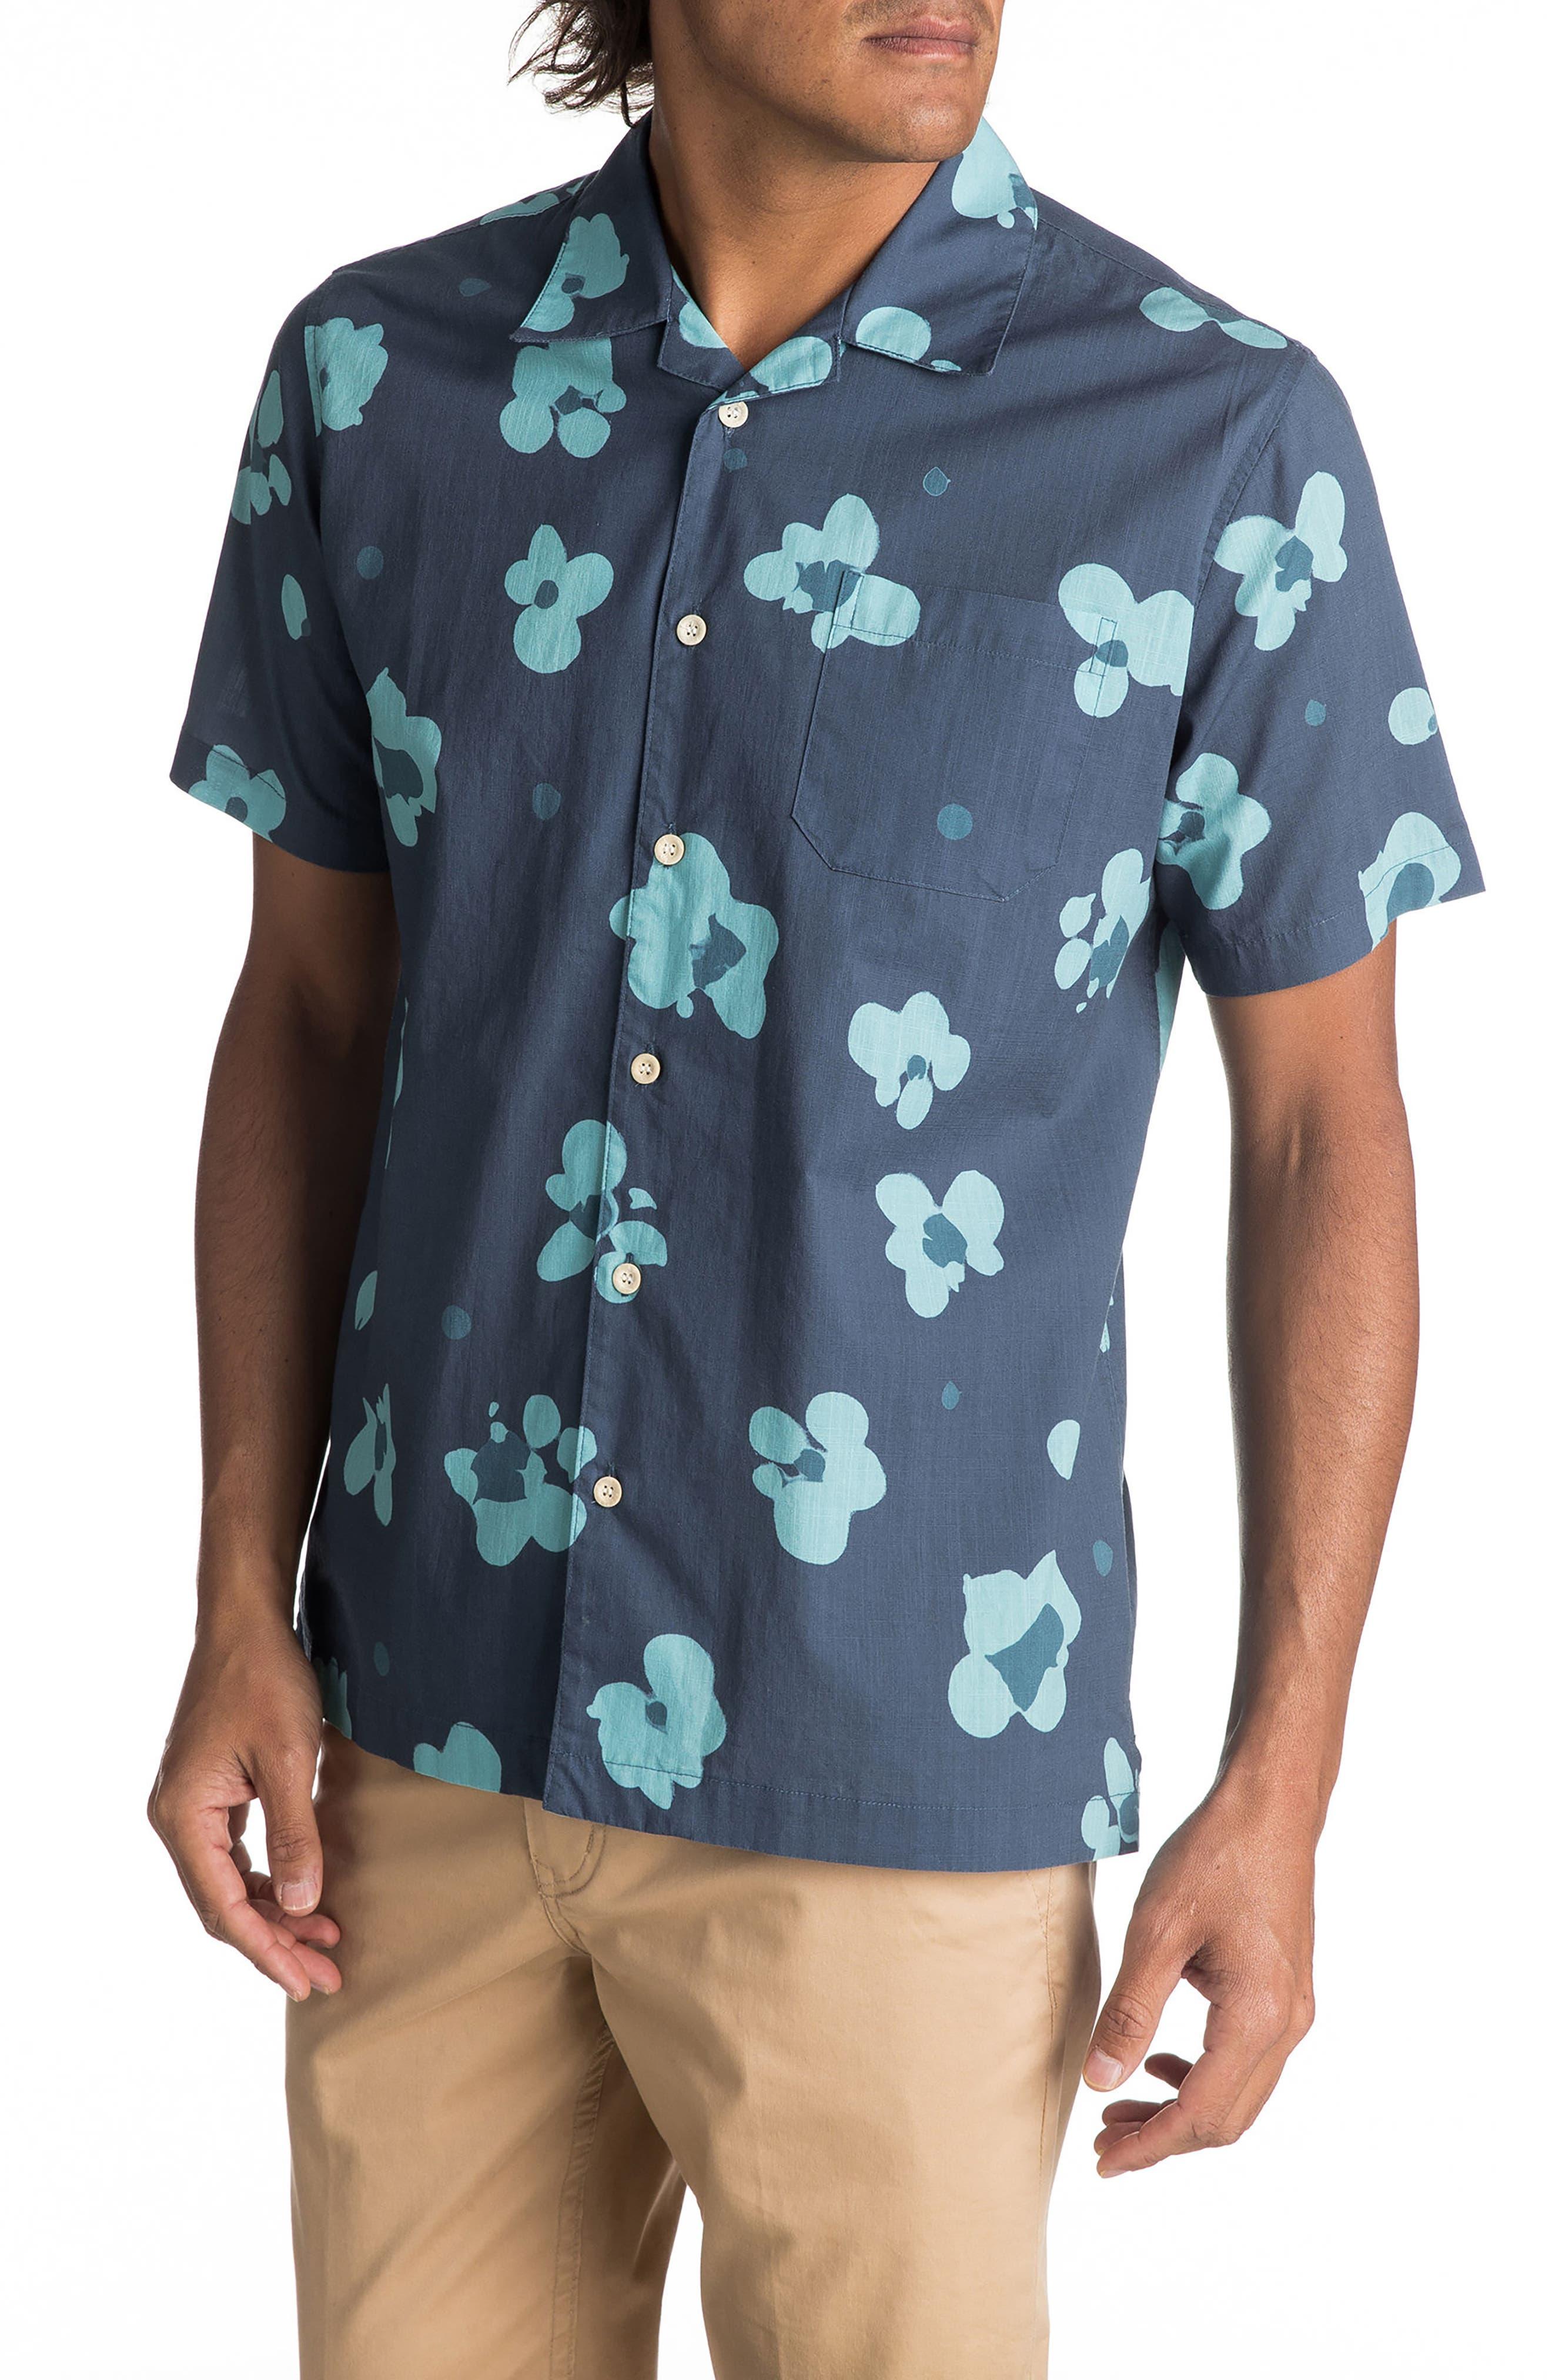 Waterfloral Camp Shirt,                         Main,                         color, Ensign Blue